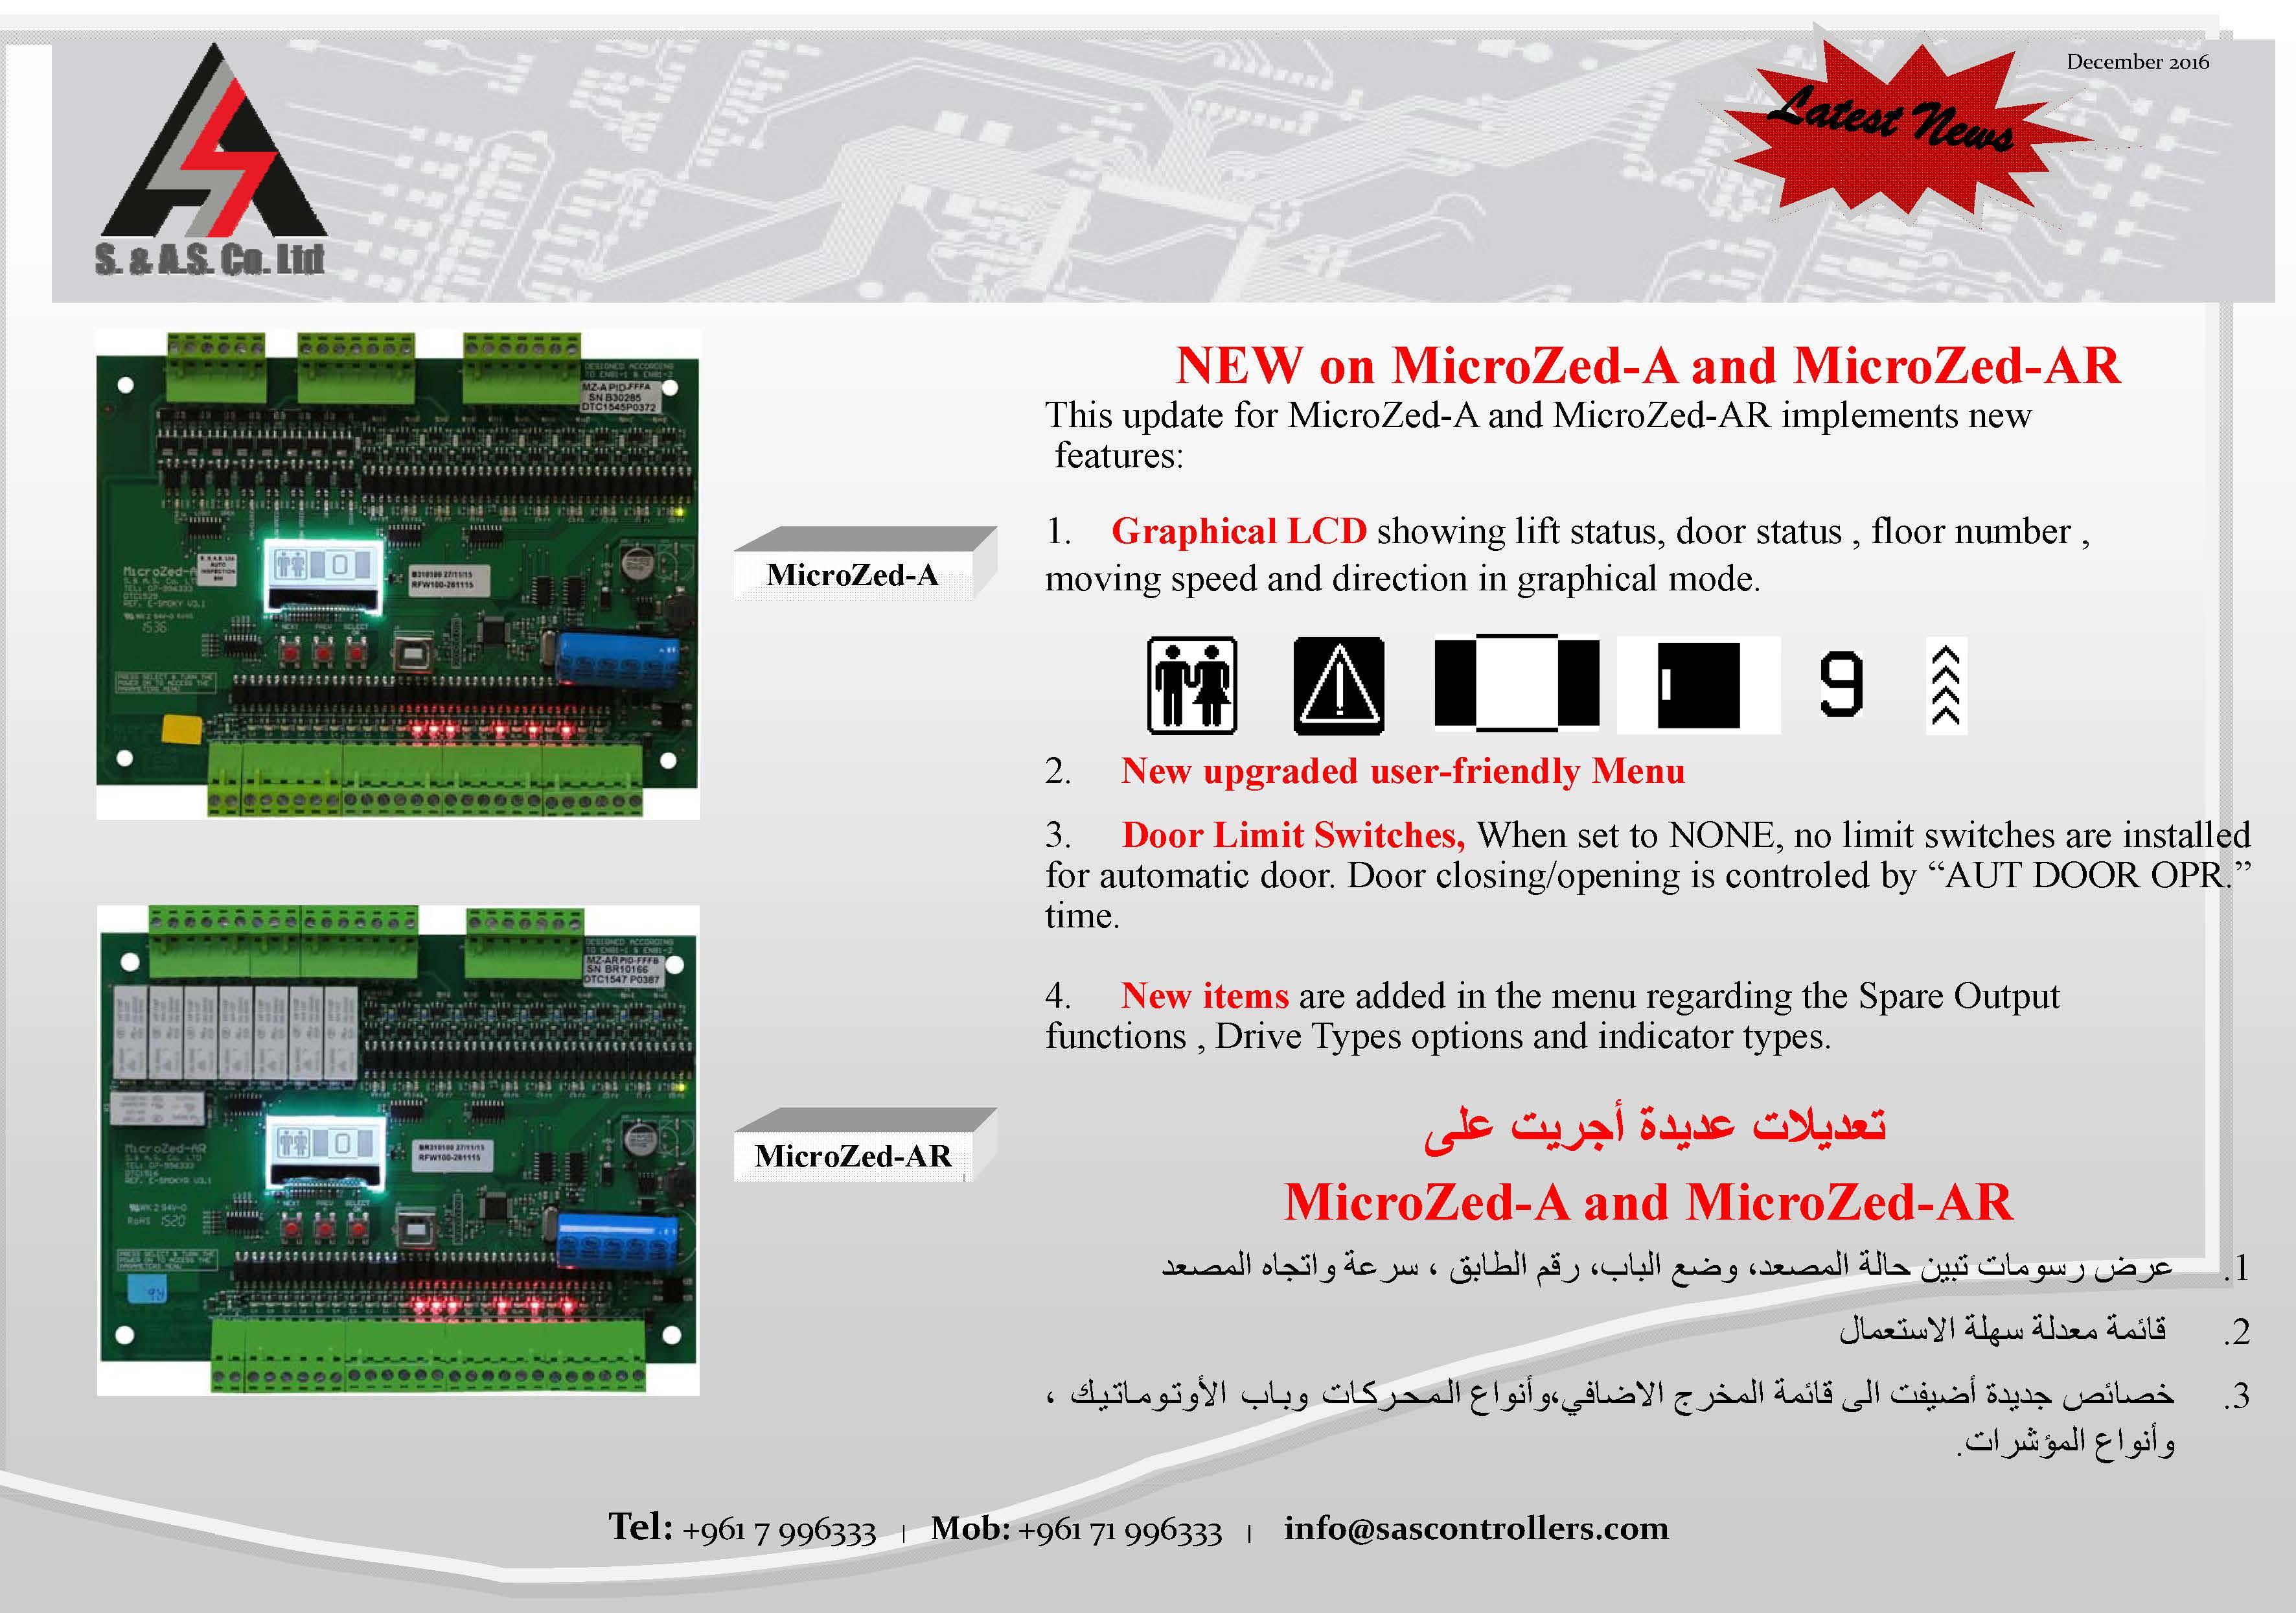 MicroZed-A And MicroZed-AR